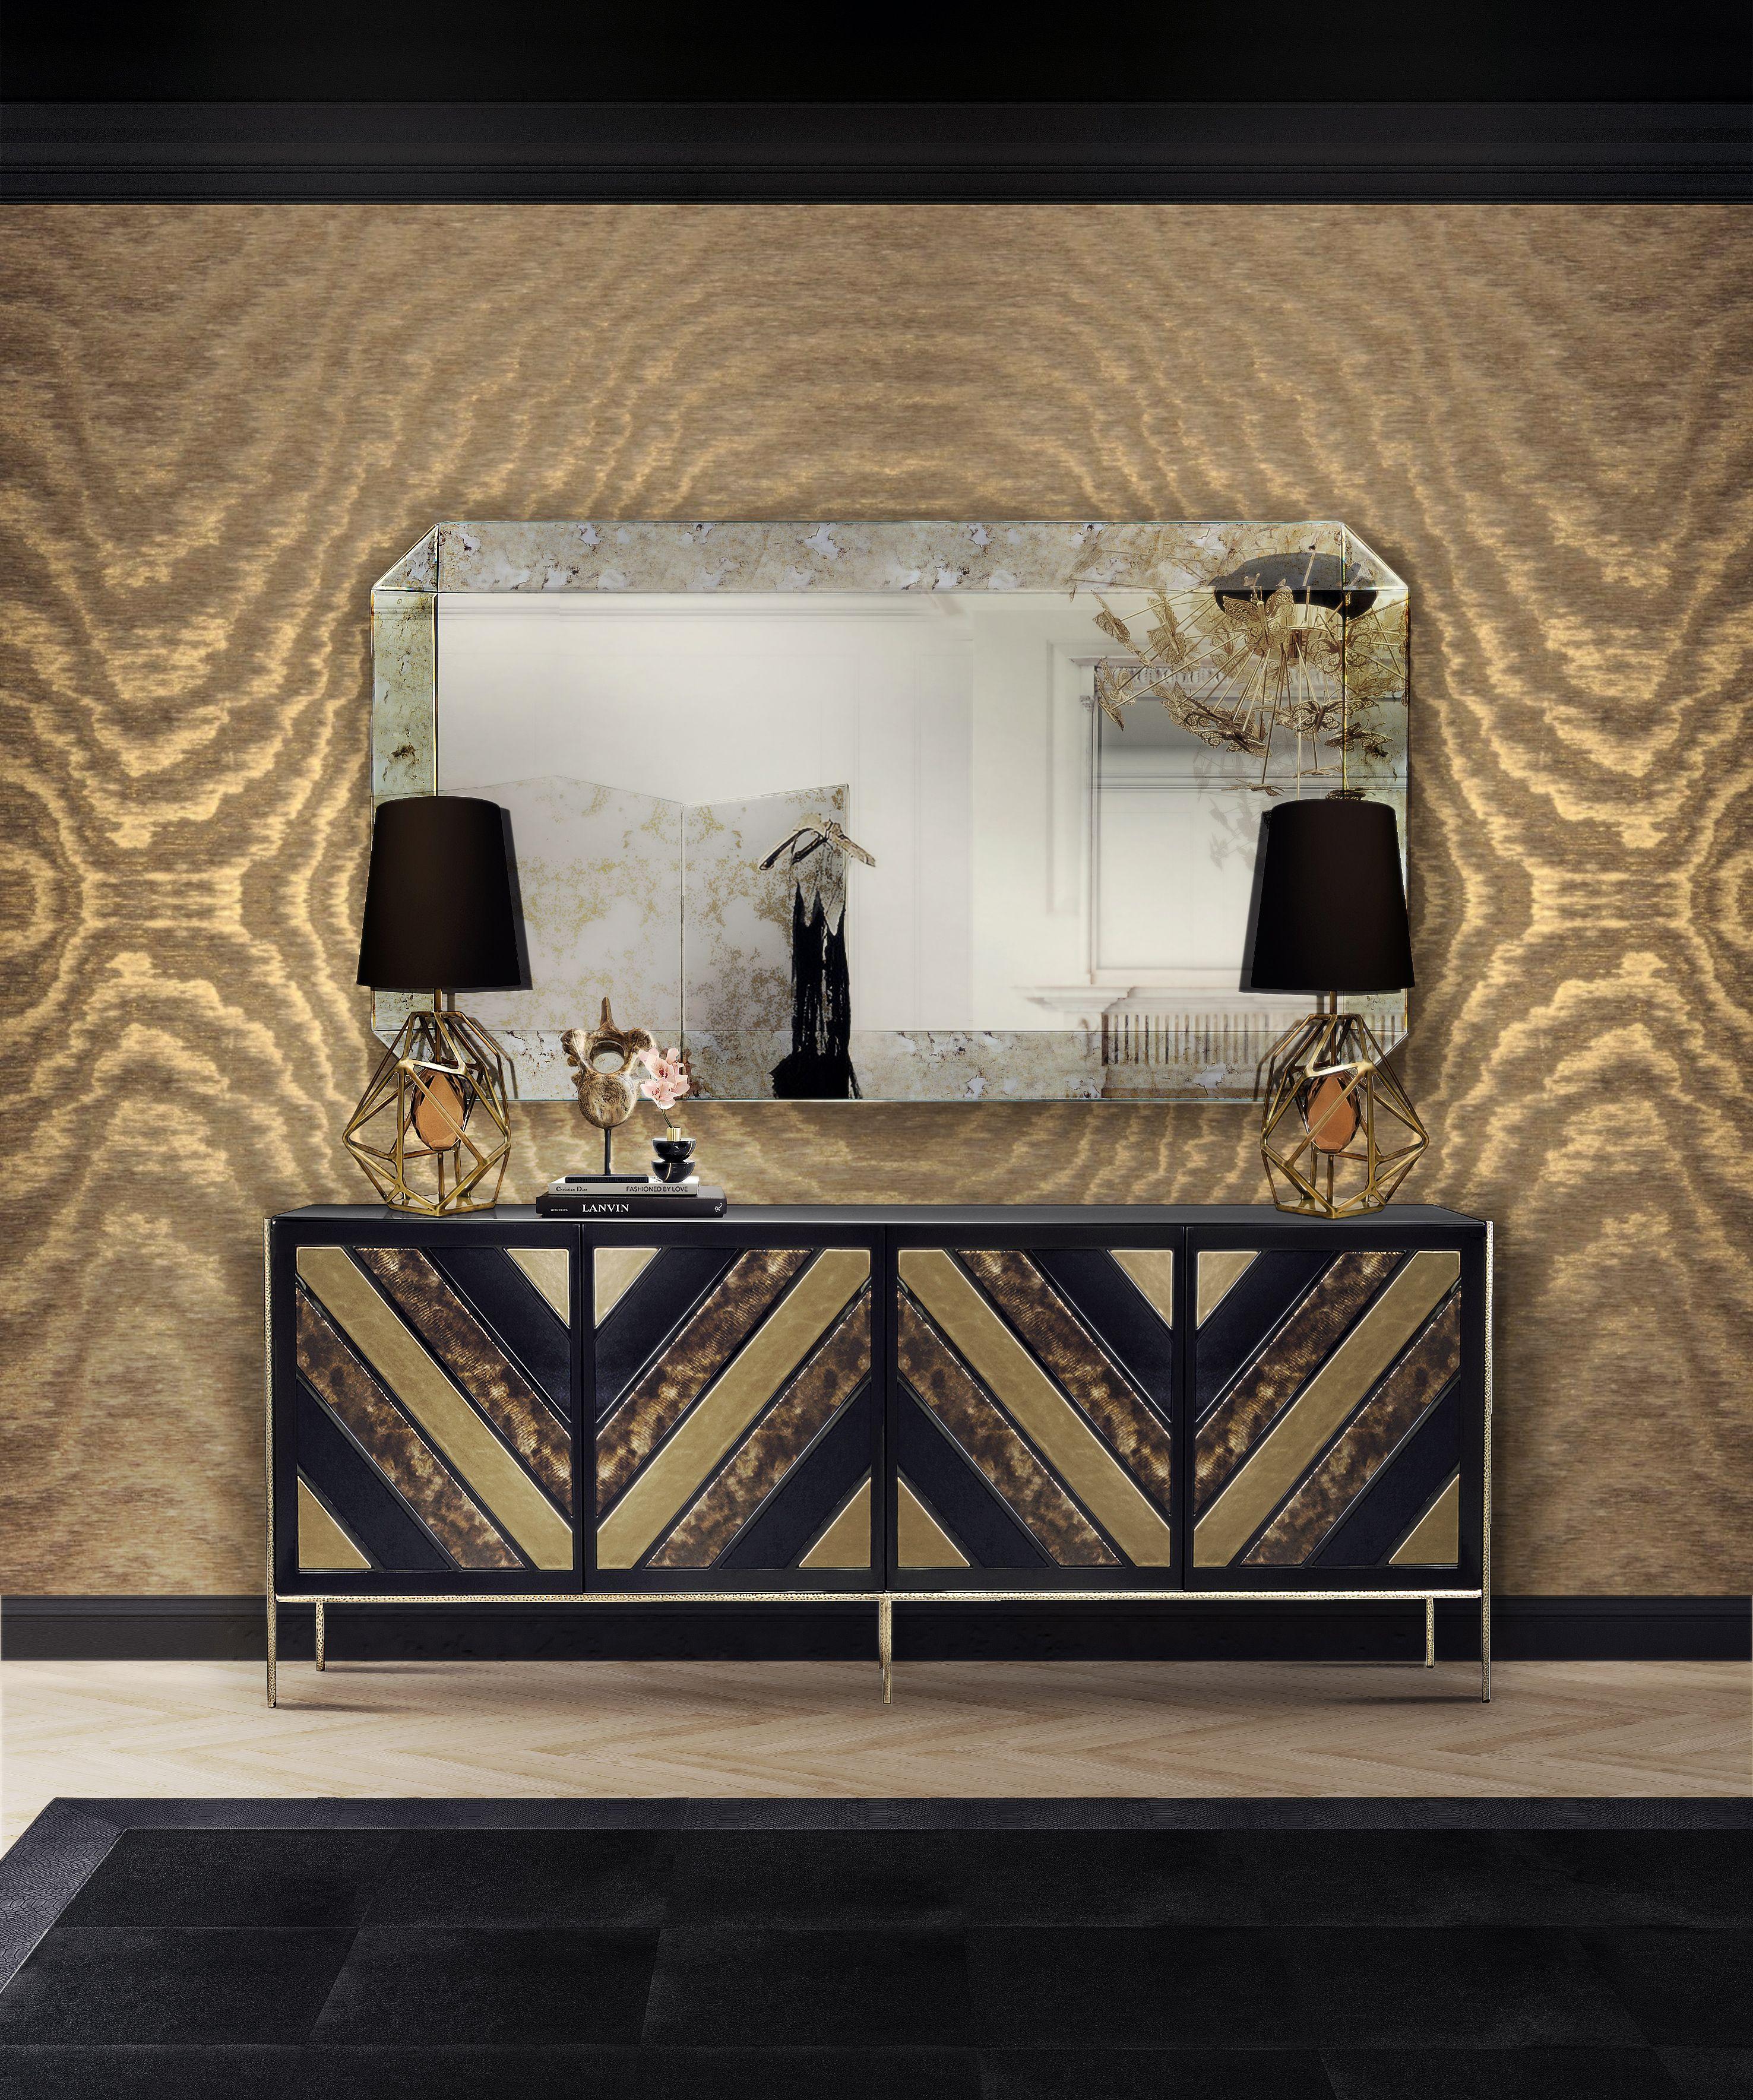 Top 10 Mirror Design For Living Room Living Decor Luxury Furniture Brands Luxury Furniture